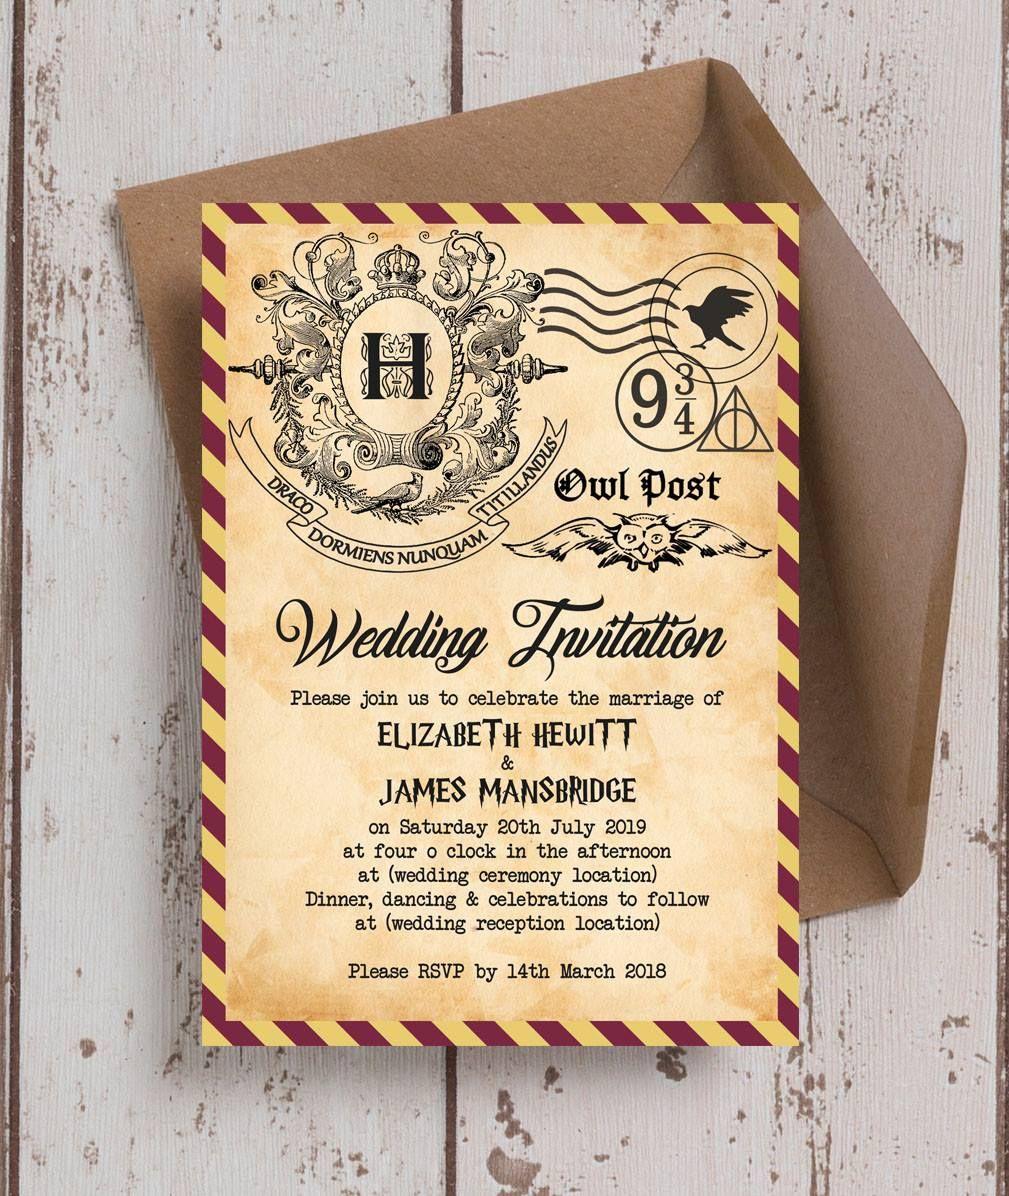 Amazing Harry Potter themed wedding invitations. 5\